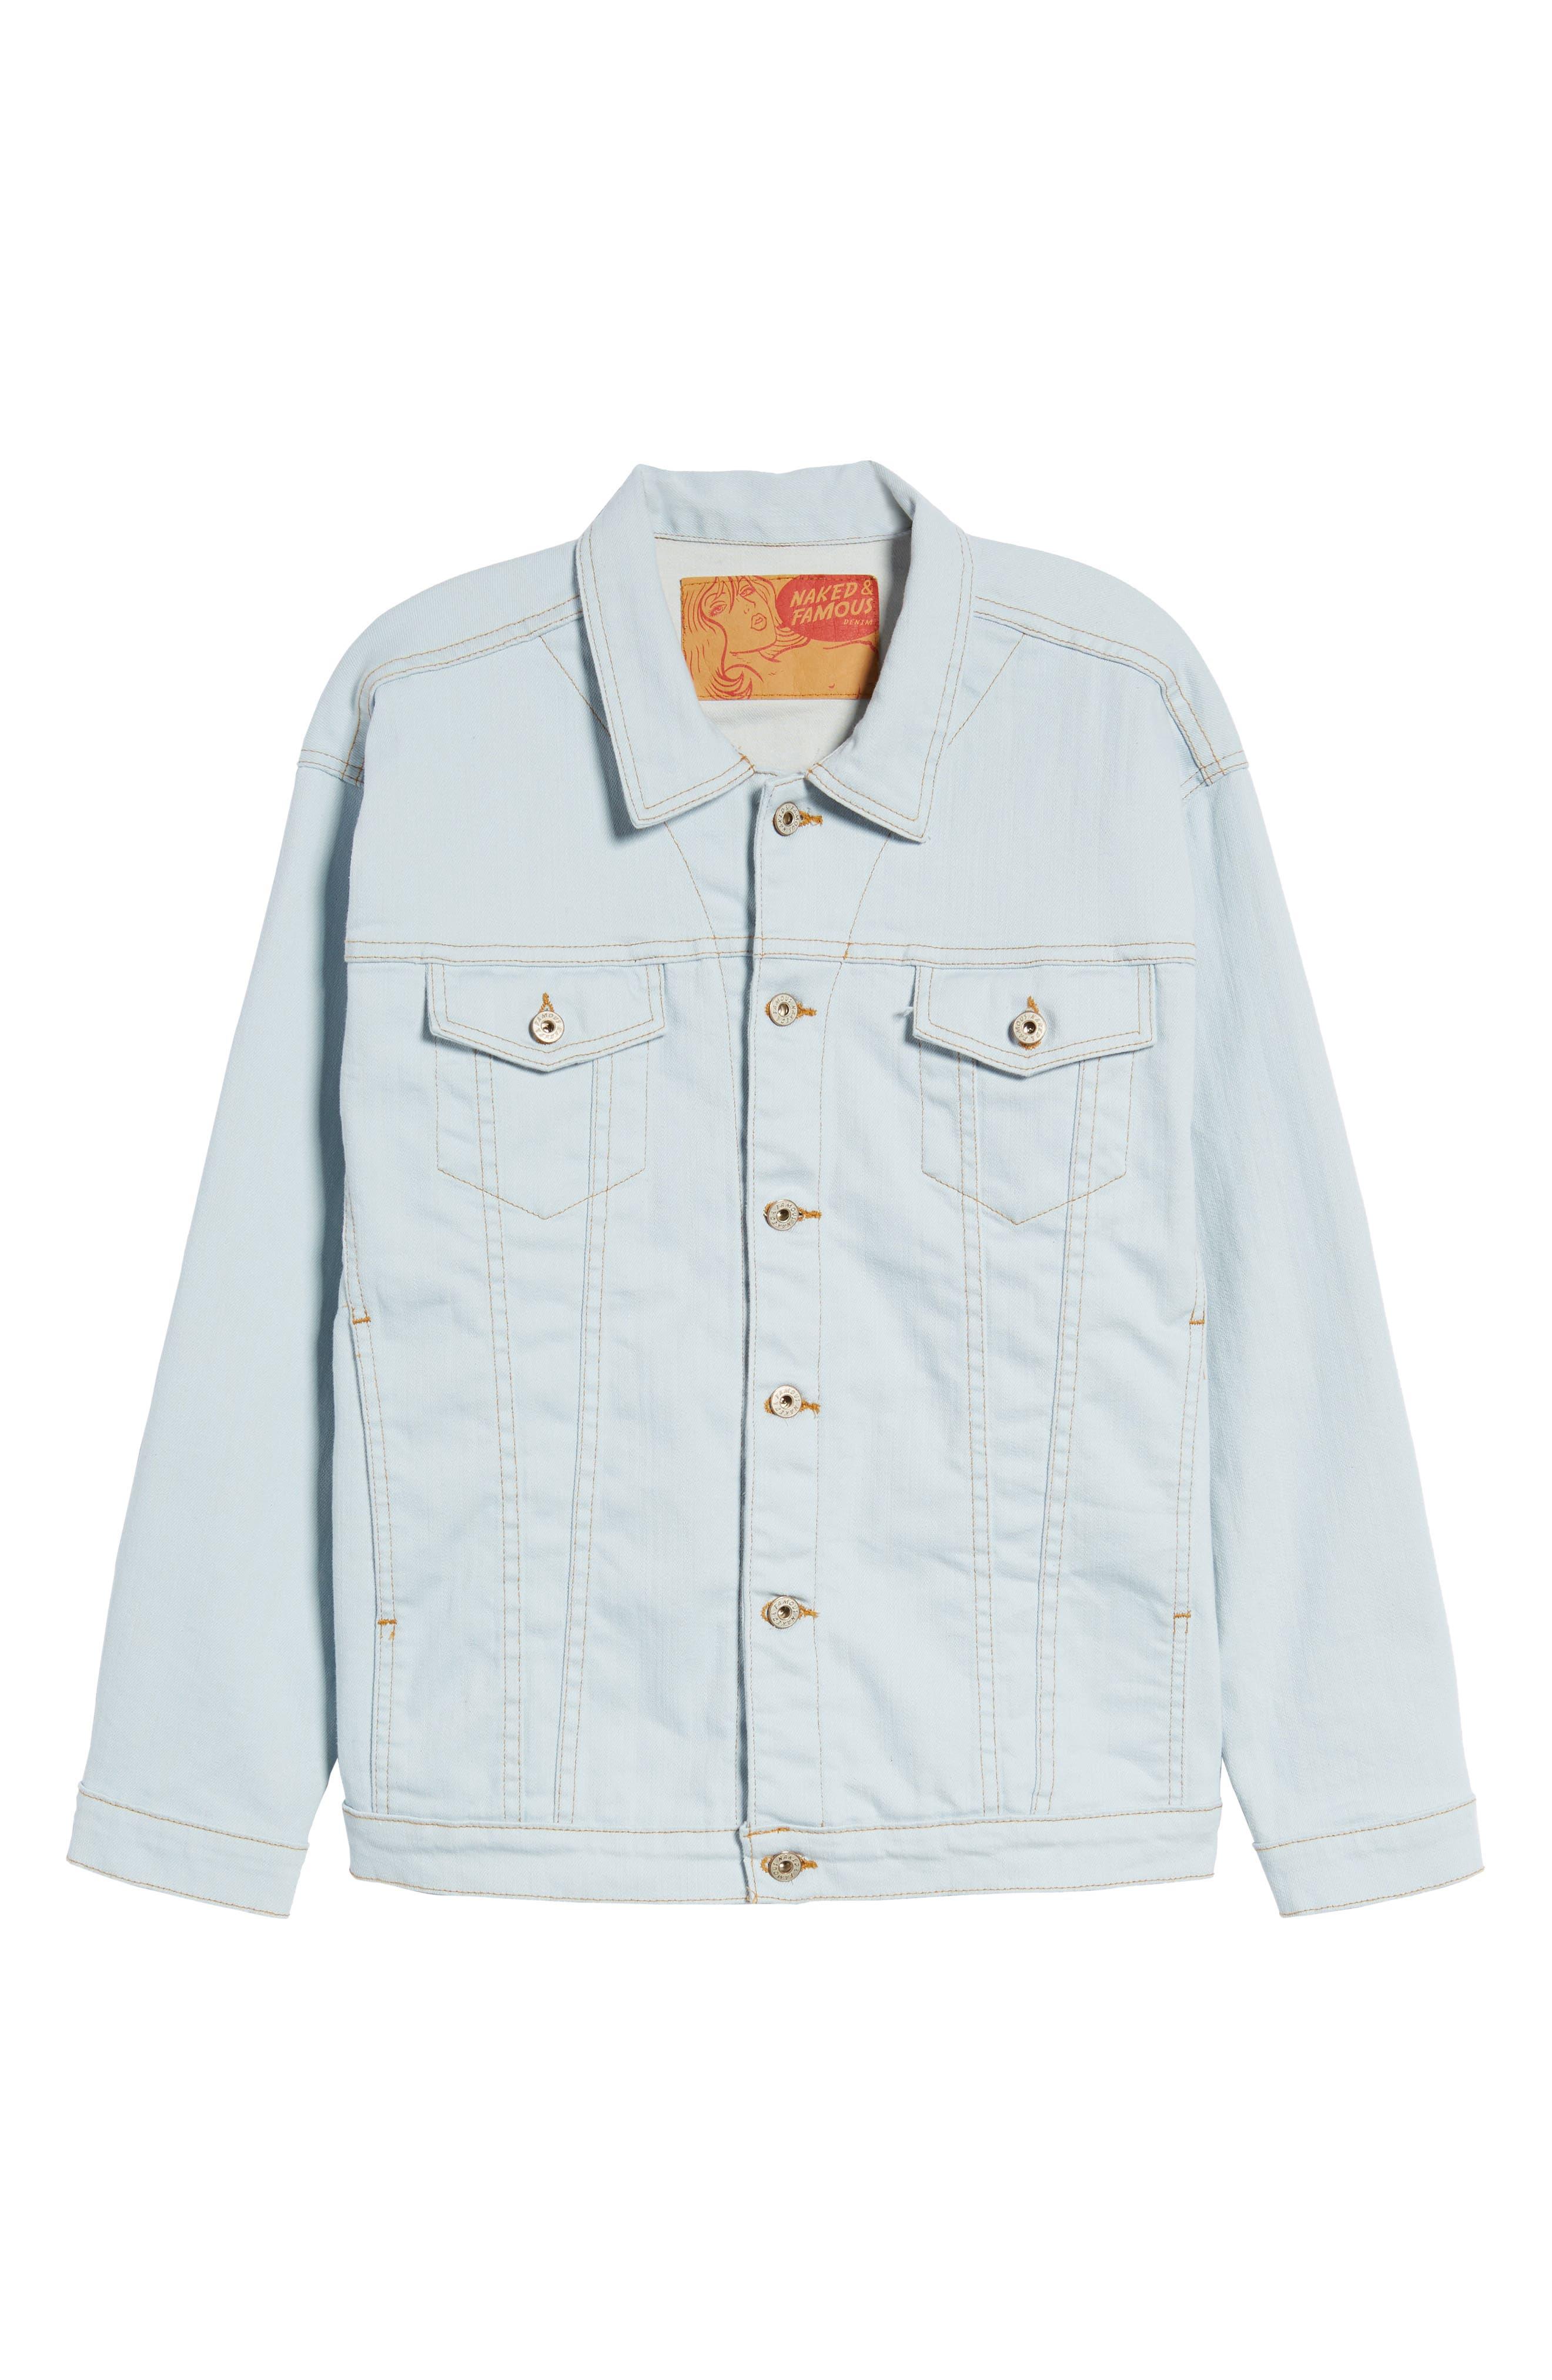 Oversize Jacket,                             Alternate thumbnail 5, color,                             401